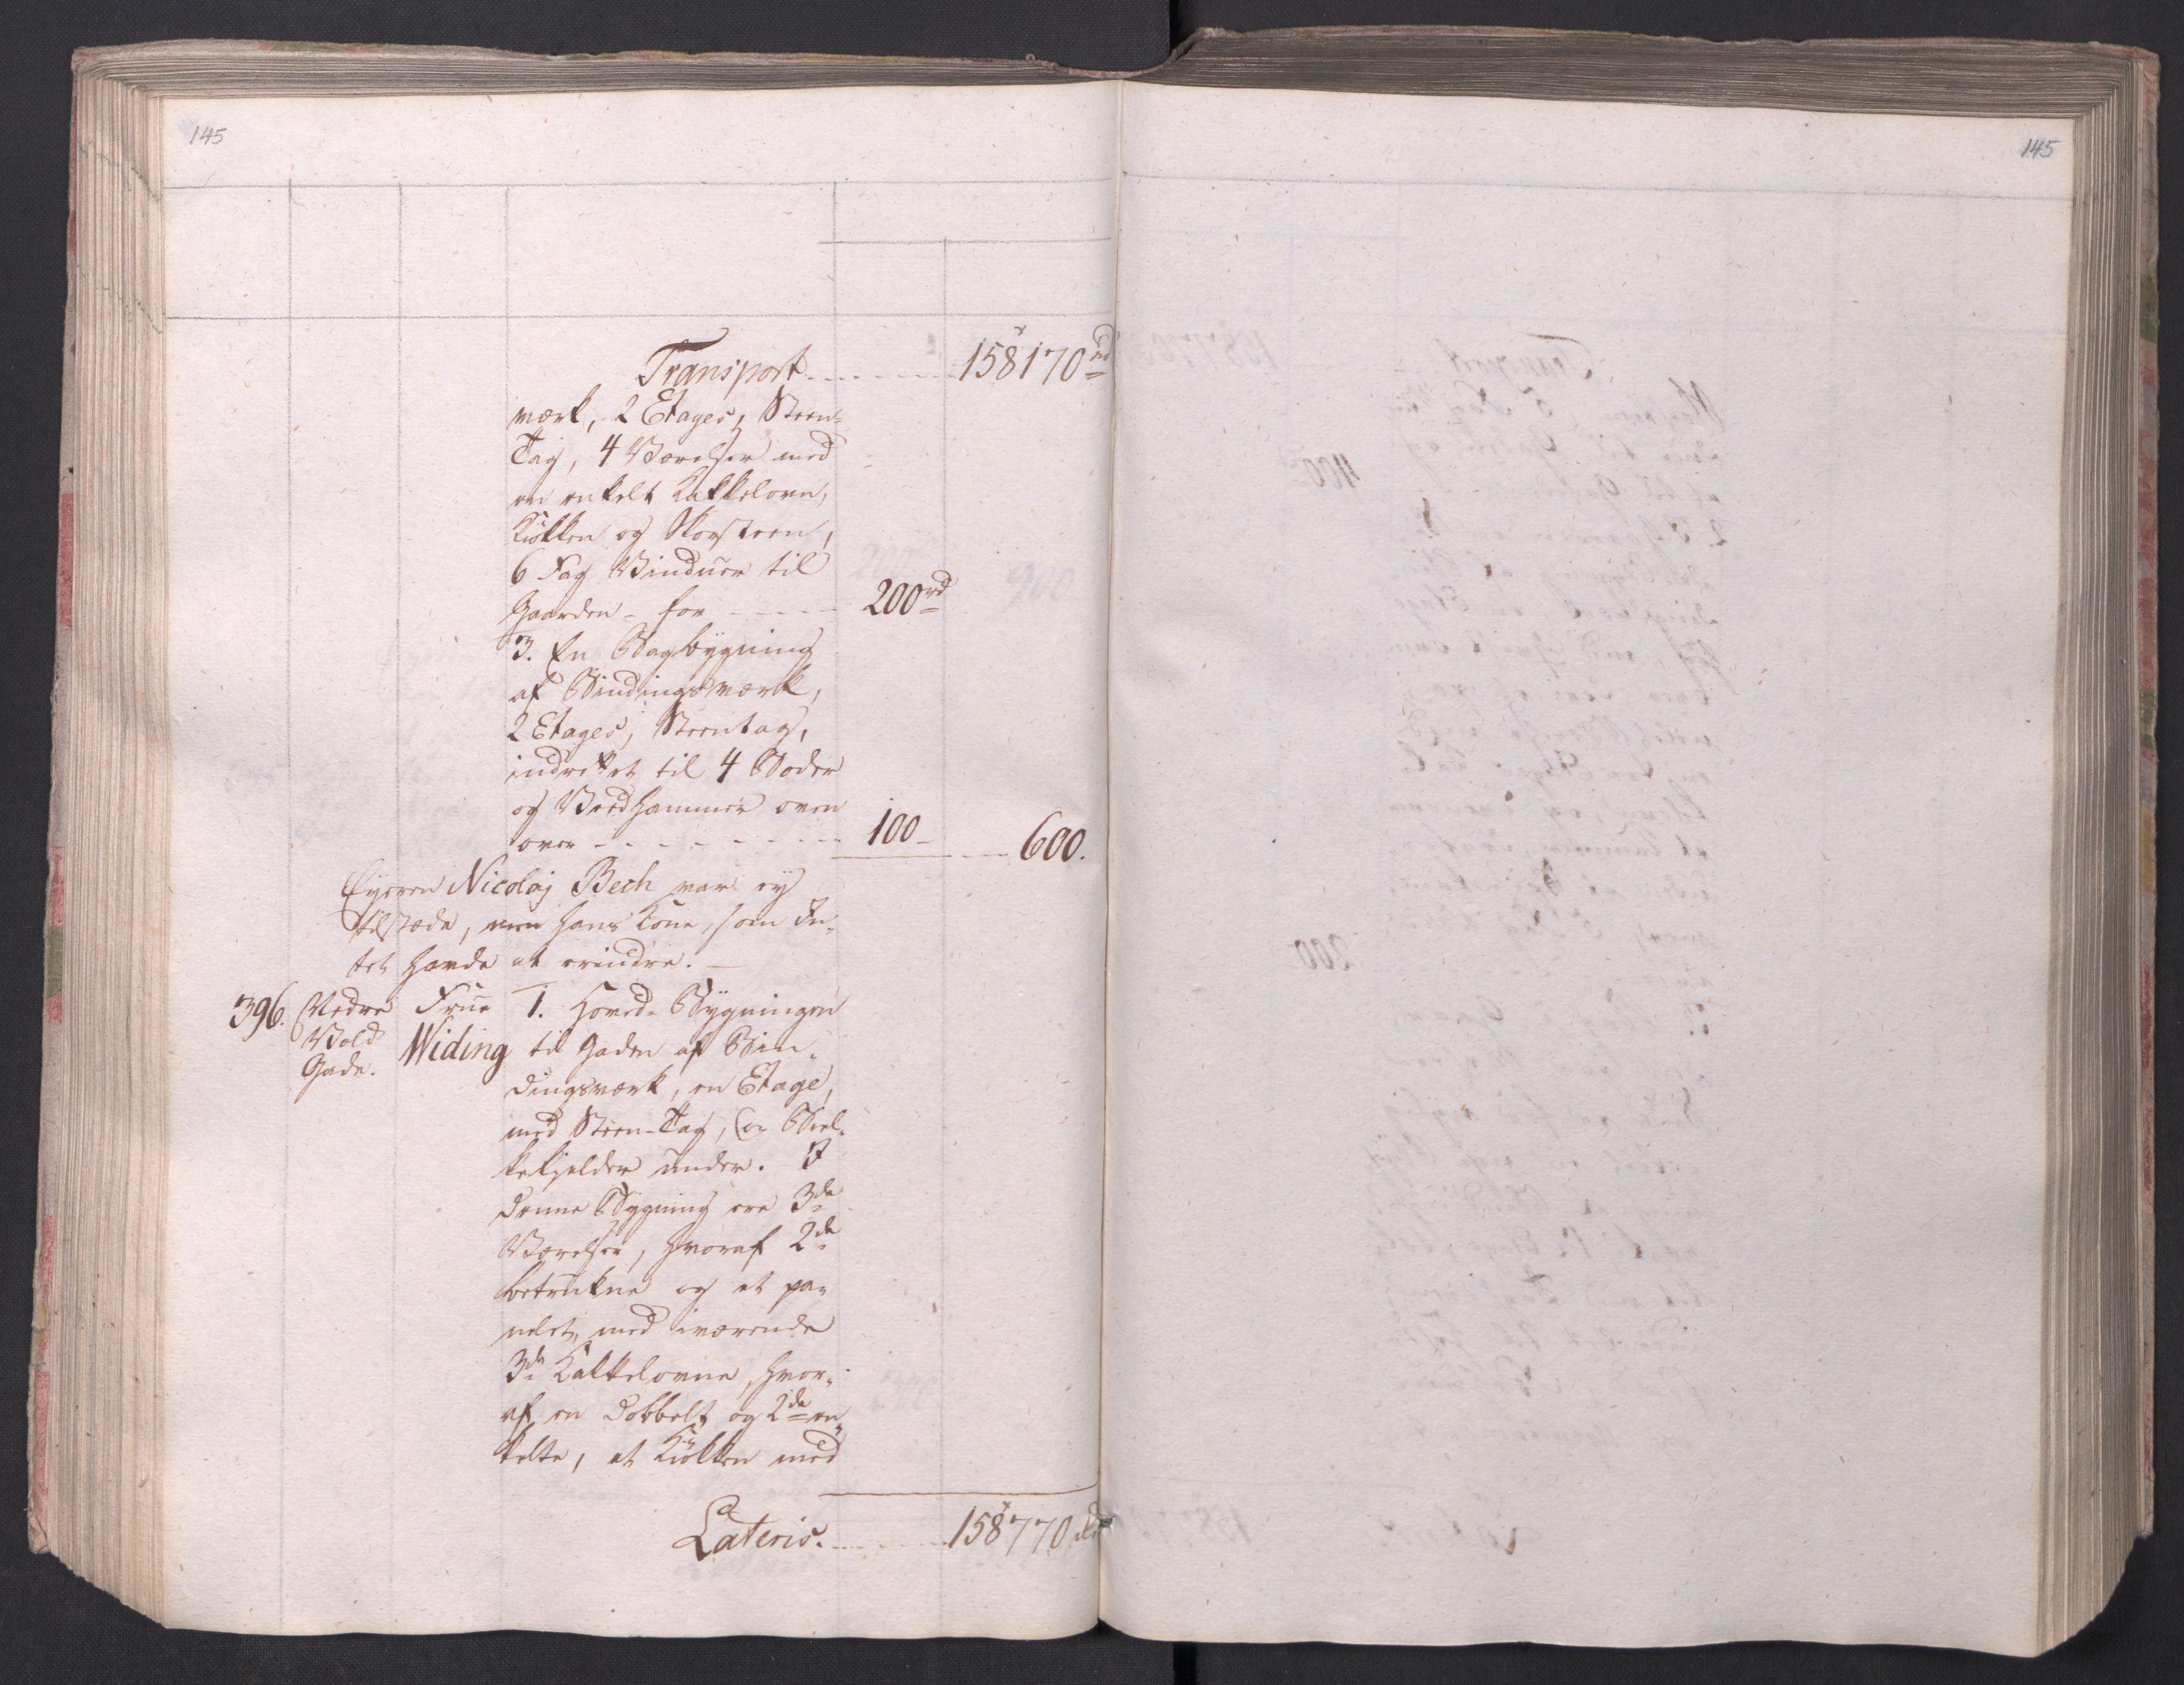 SAO, Kristiania stiftamt, I/Ia/L0015: Branntakster, 1797, s. 145